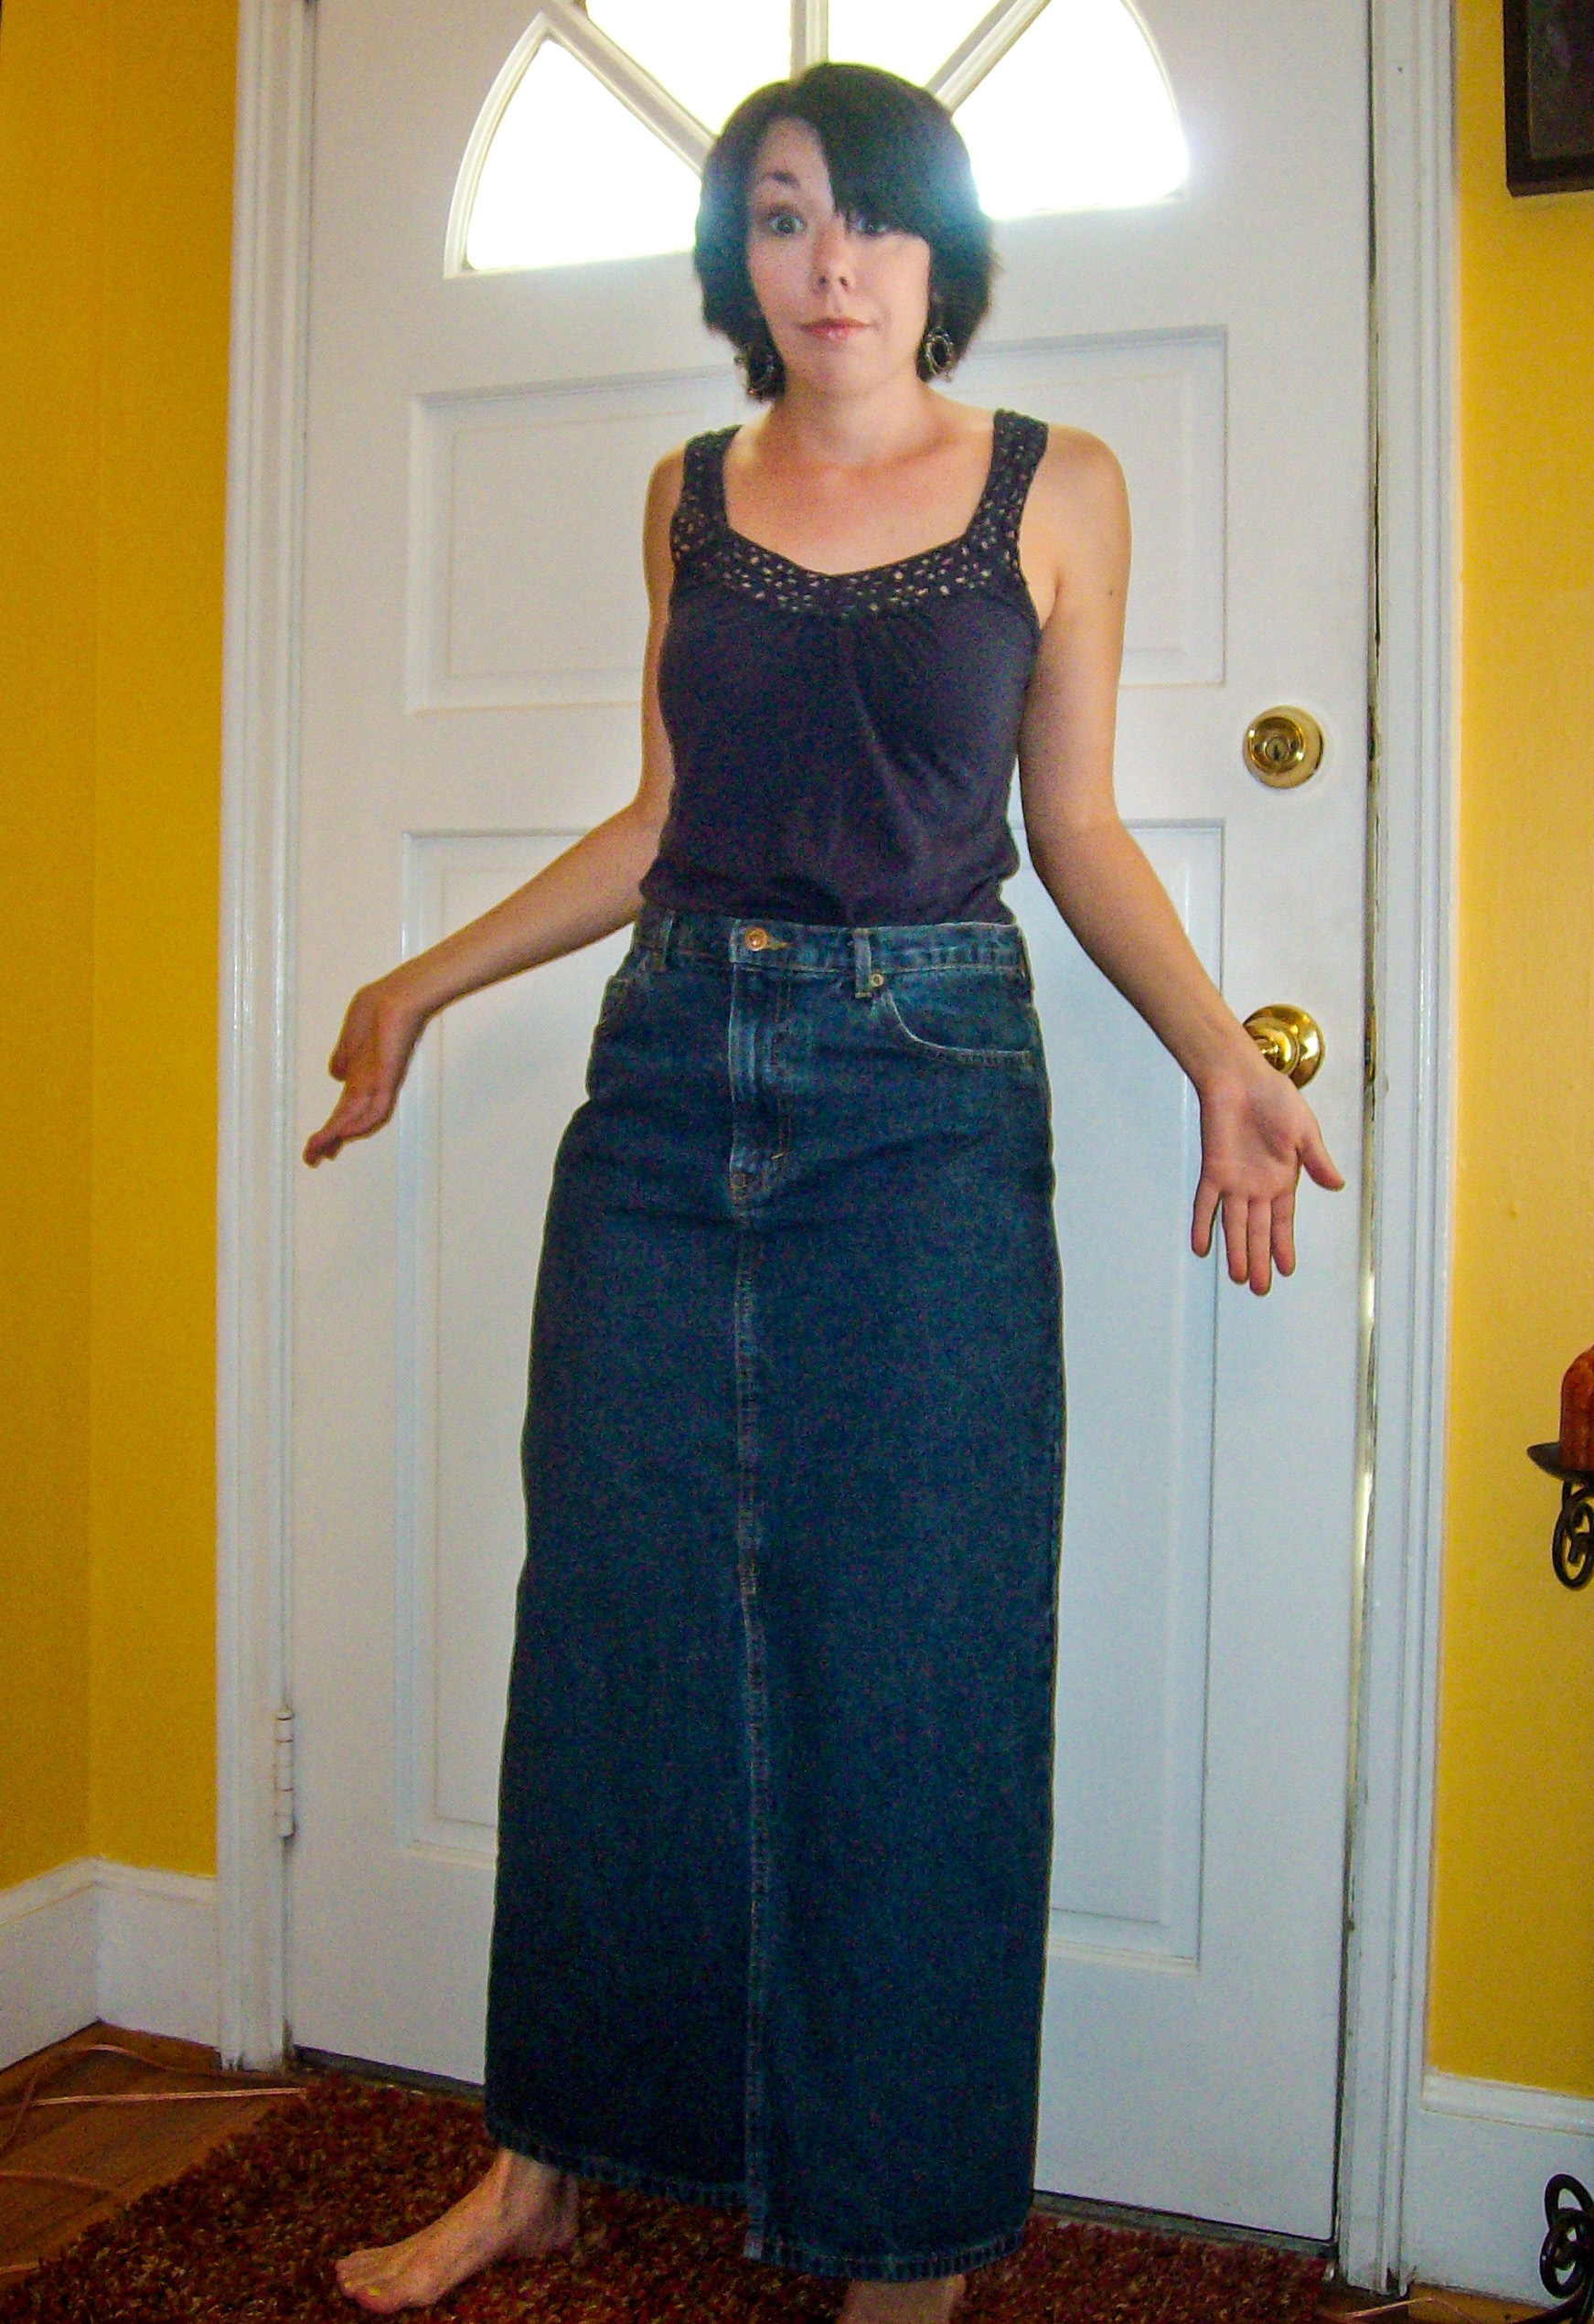 diy distressed denim skirt refashion